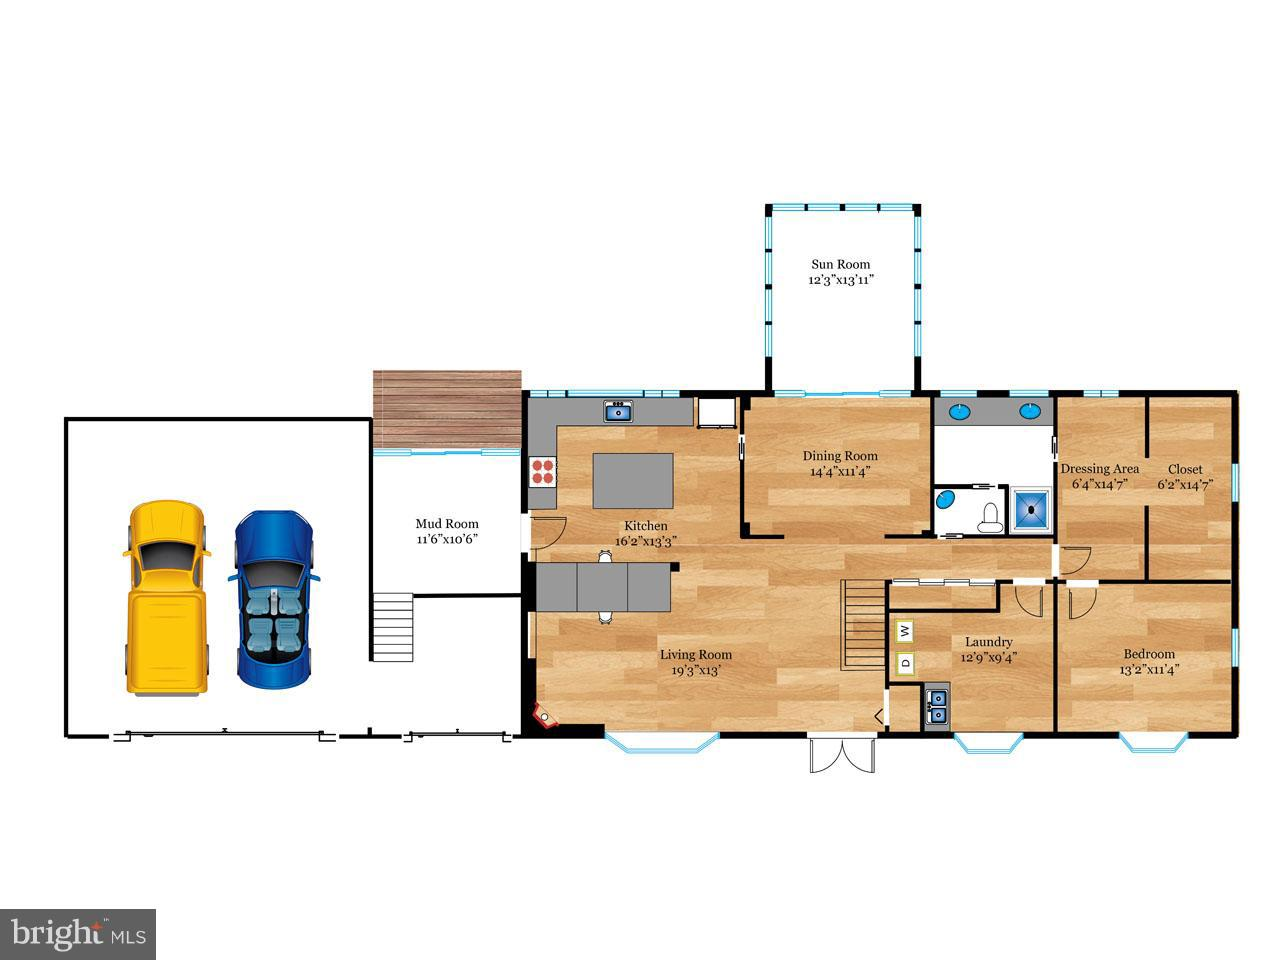 1002303700-300502419393-2021-07-22-03-27-23  |   | Alexandria Delaware Real Estate For Sale | MLS# 1002303700  - Best of Northern Virginia